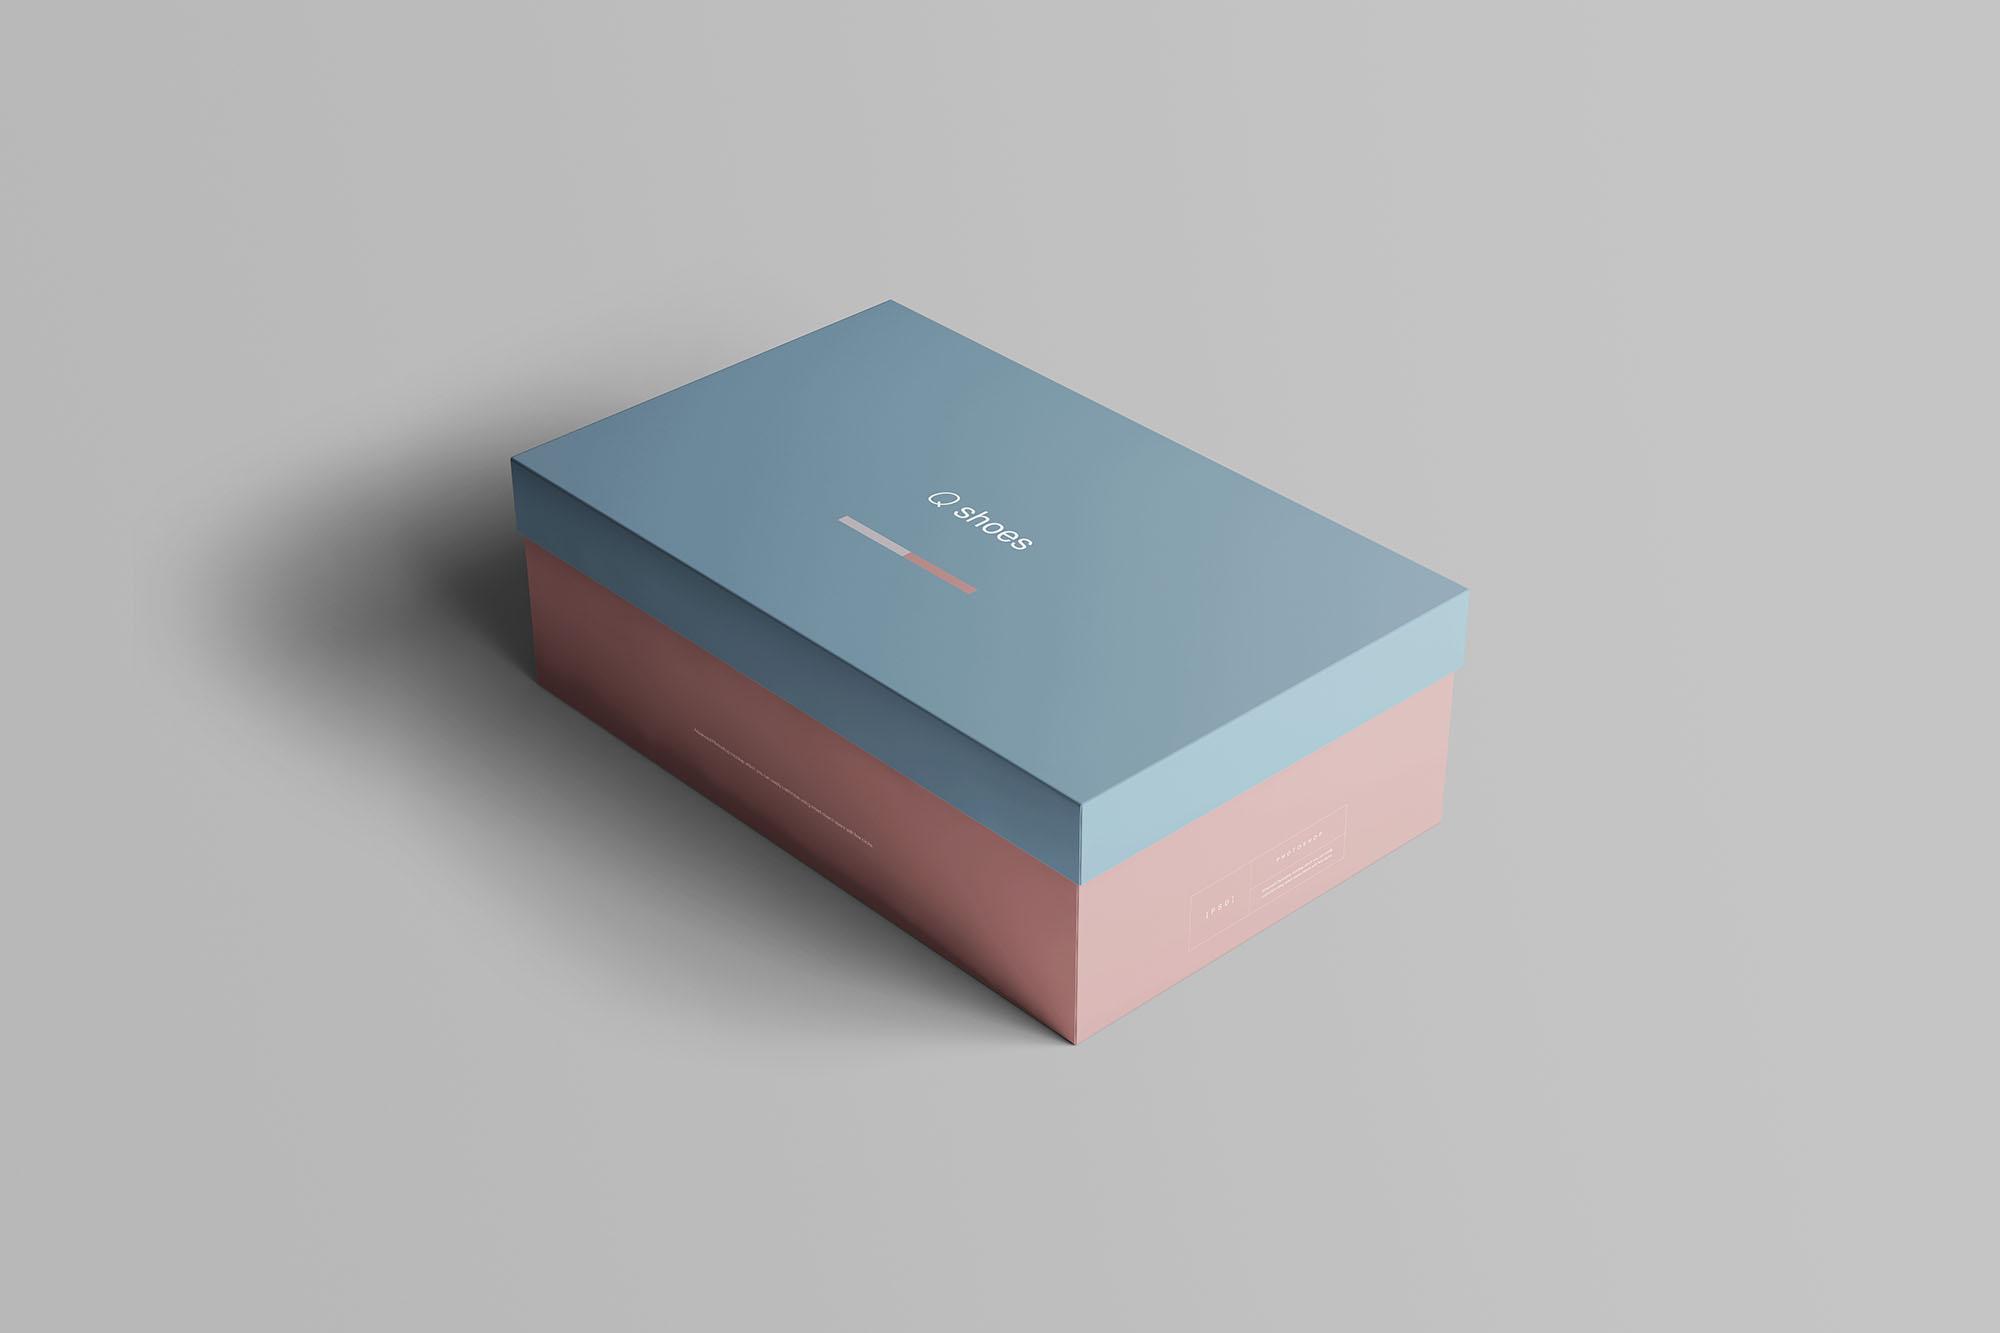 时尚高端专业的高品质鞋盒包装盒设计VI样机展示模型mockups Shoe Box Mockup